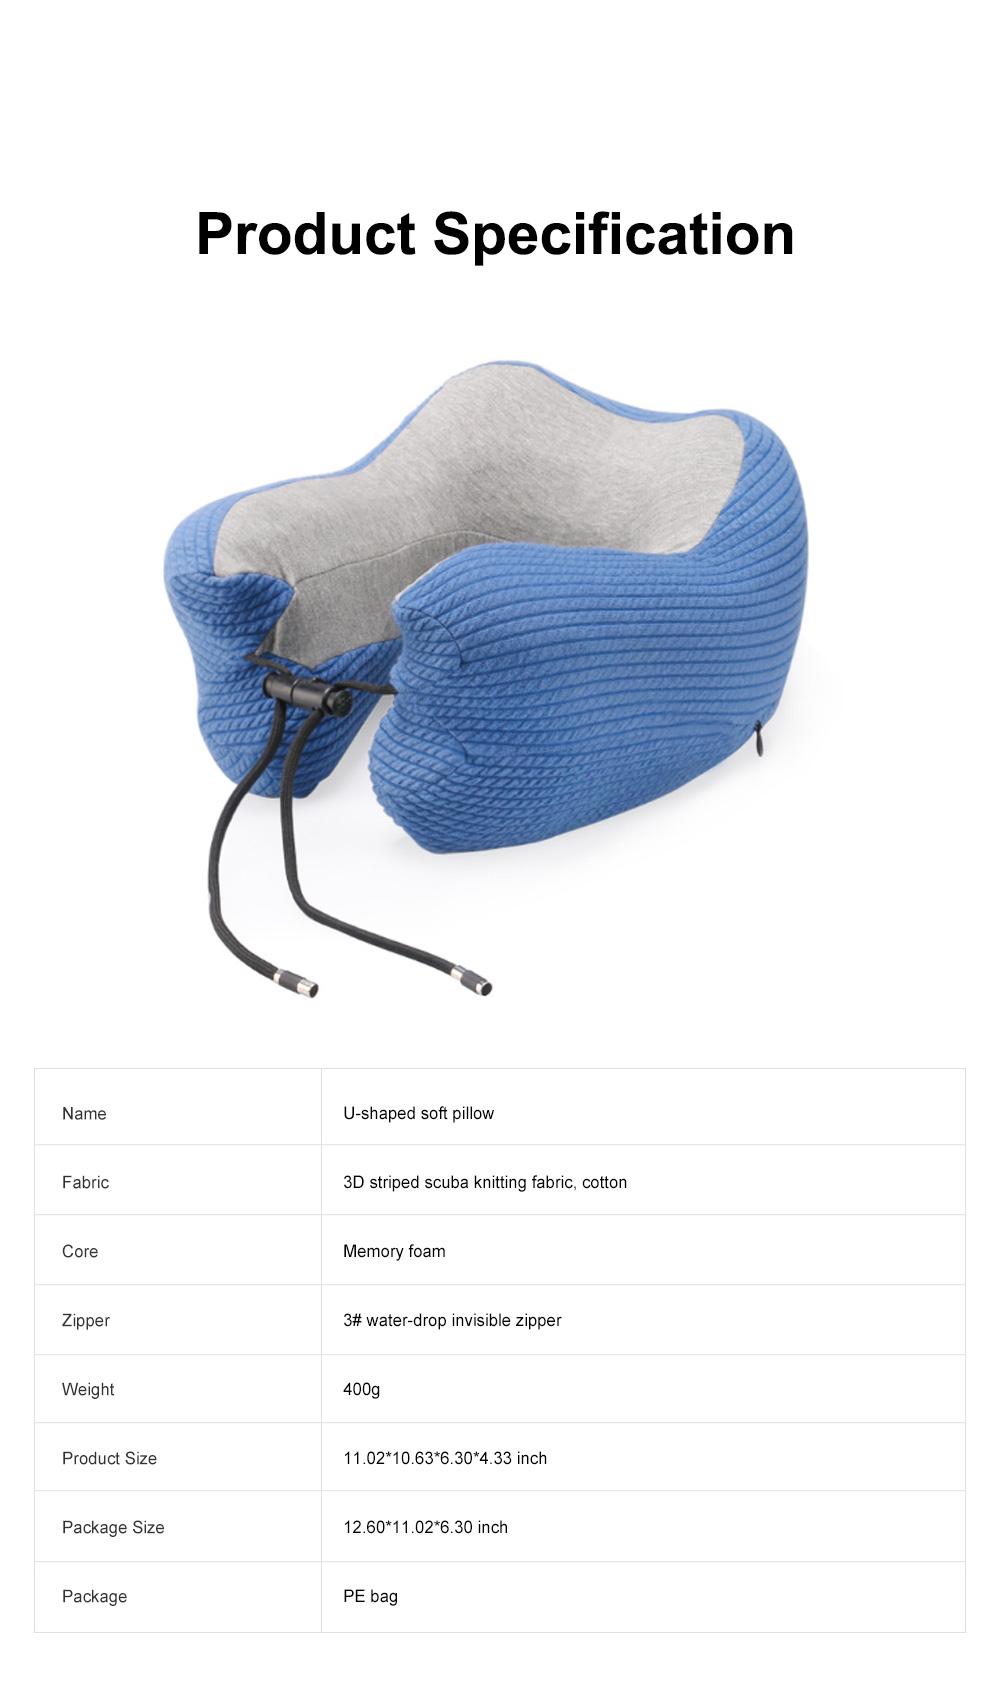 Slow Rebound Memory Foam U-Shaped Soft Pillow, Functional Office School Noon Break Pillow with Adjustable String Buckle 7